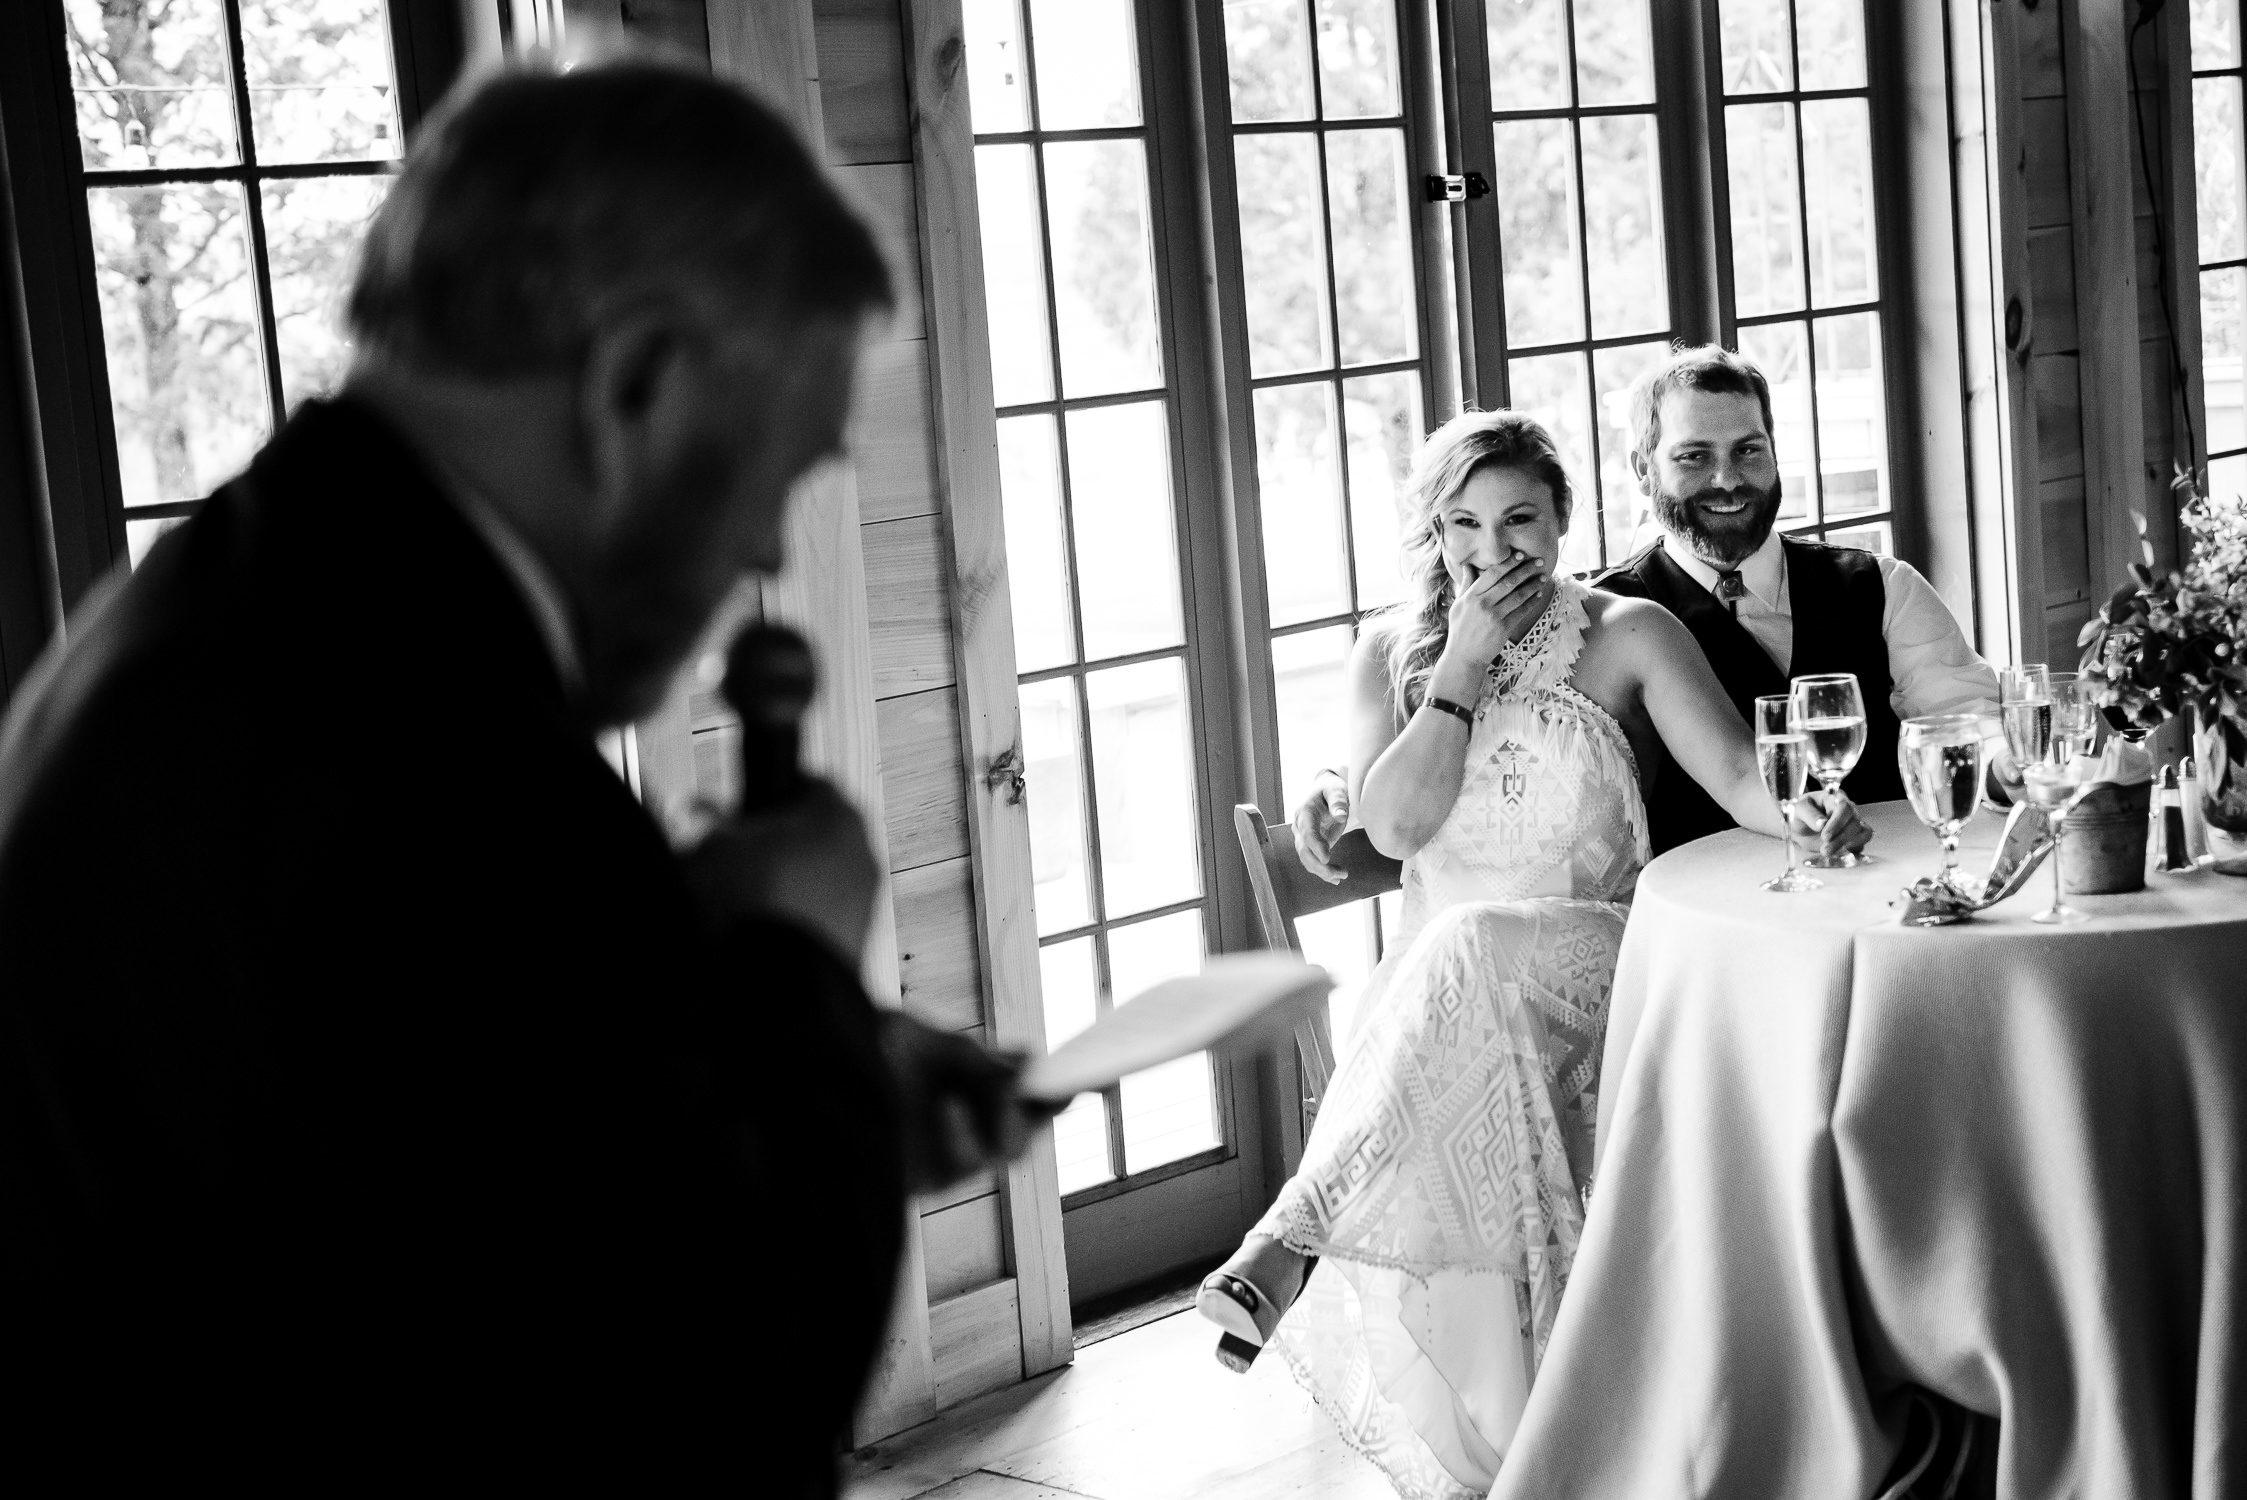 tourterelle-vermont-wedding-photographers-032-2-2247x1500.jpg